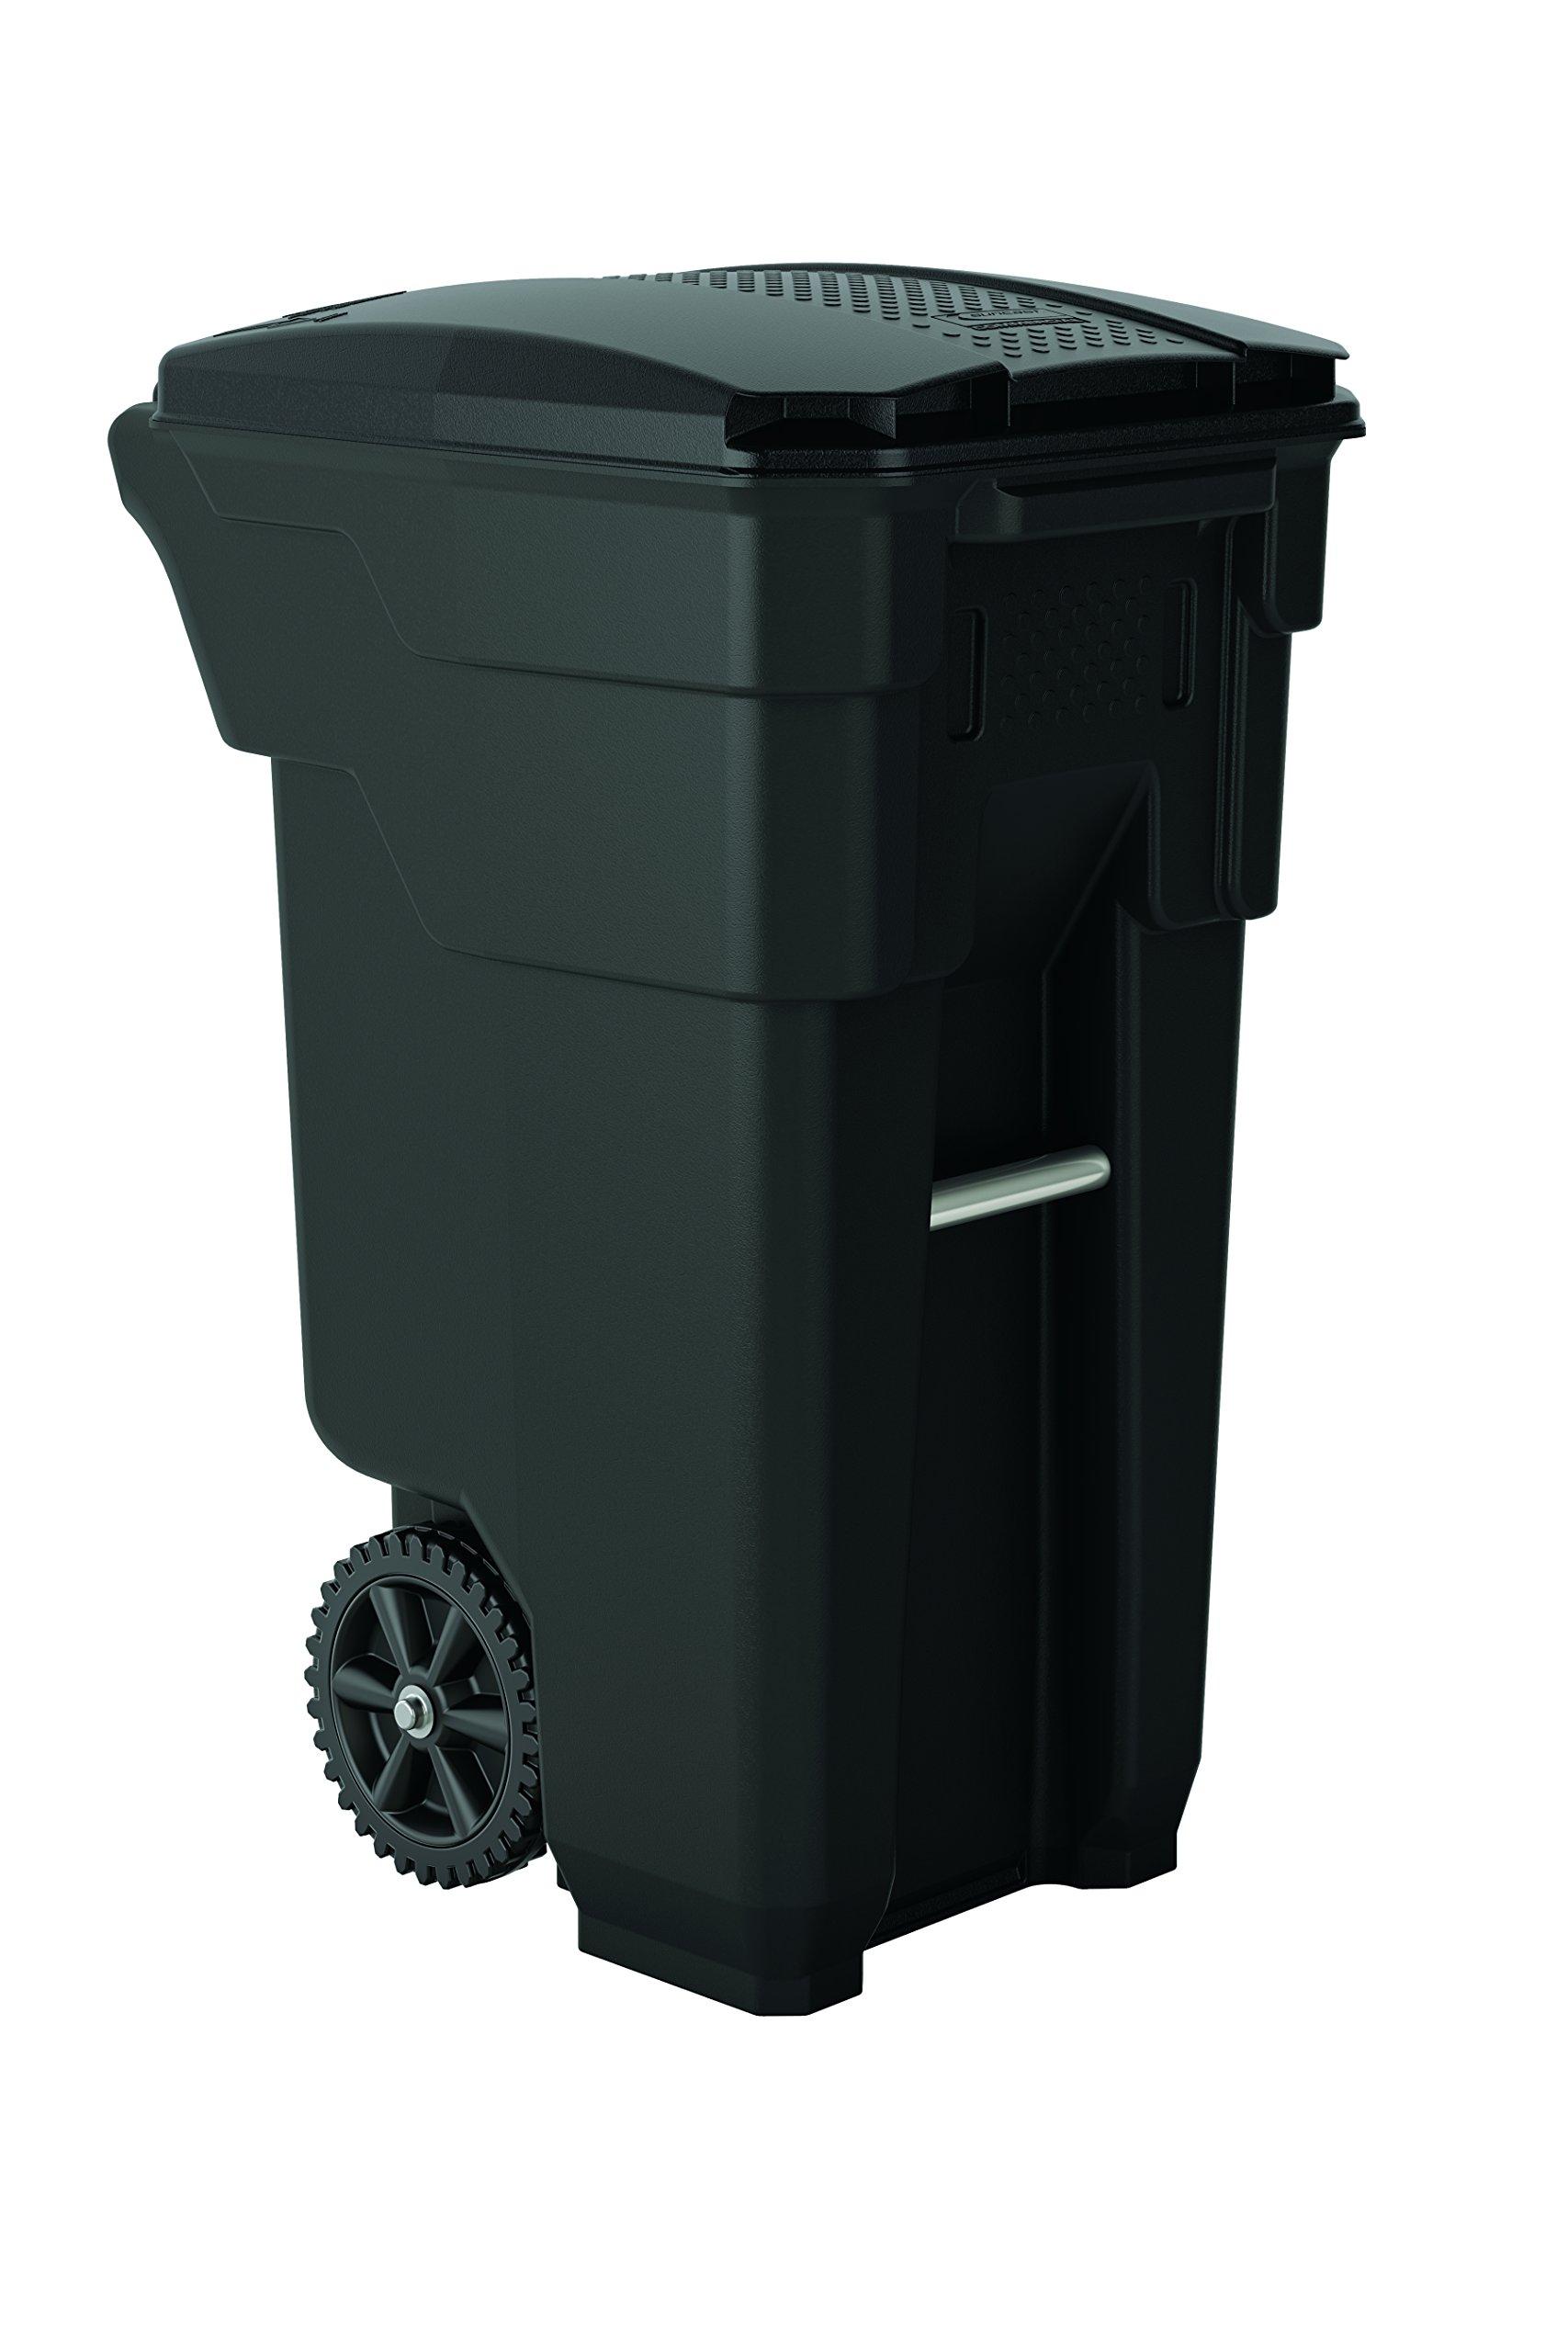 Suncast Commercial BMTCW32 Wheeled Trash Can, 36.5'' Height, 20.25'' Width, 26.5'' Length, 32 gal Capacity, Polyethylene, Gray